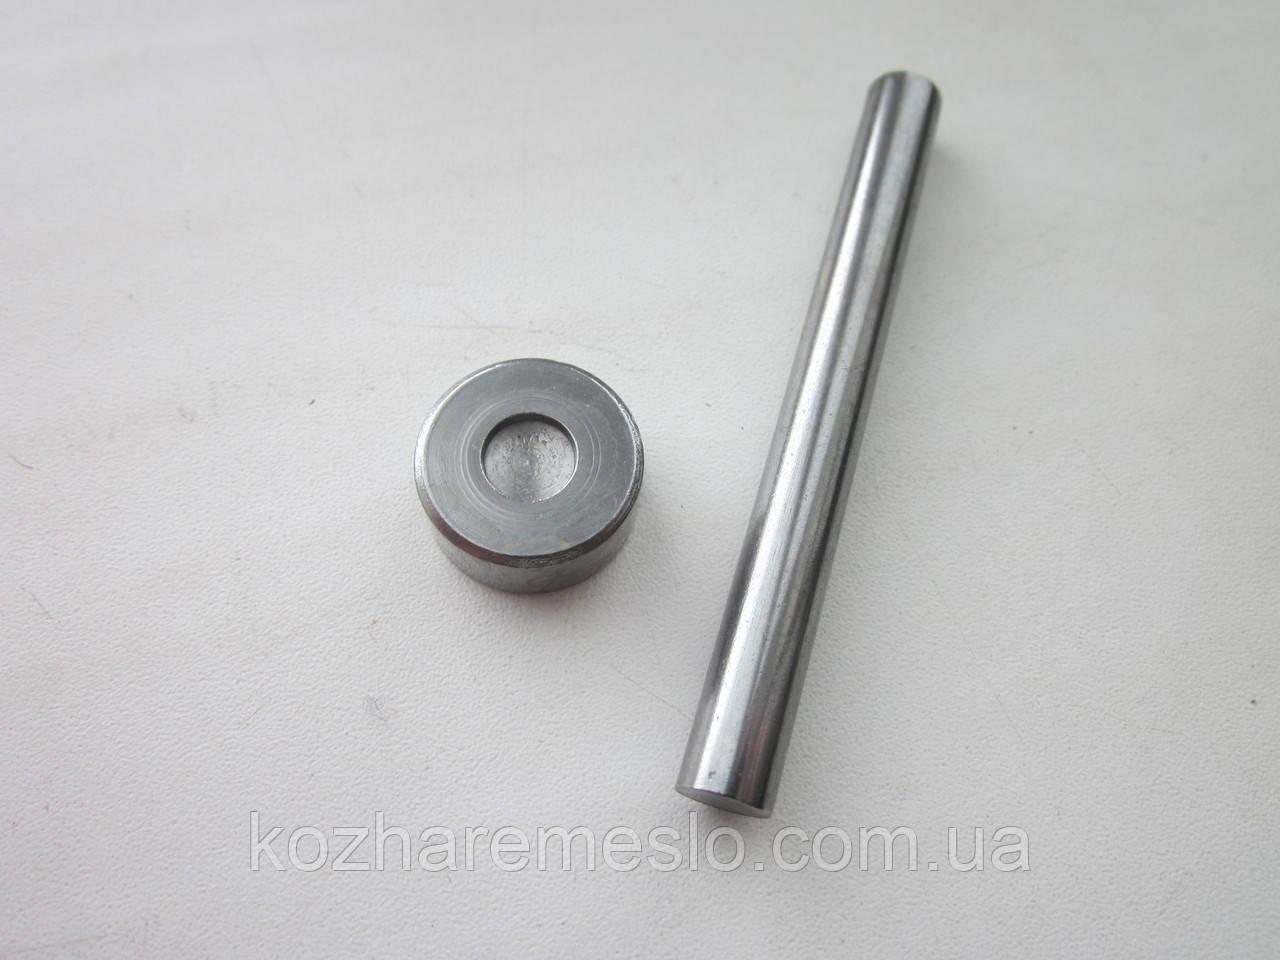 Инструмент для установки двухстороннего хольнитена 8 х 8 х 8